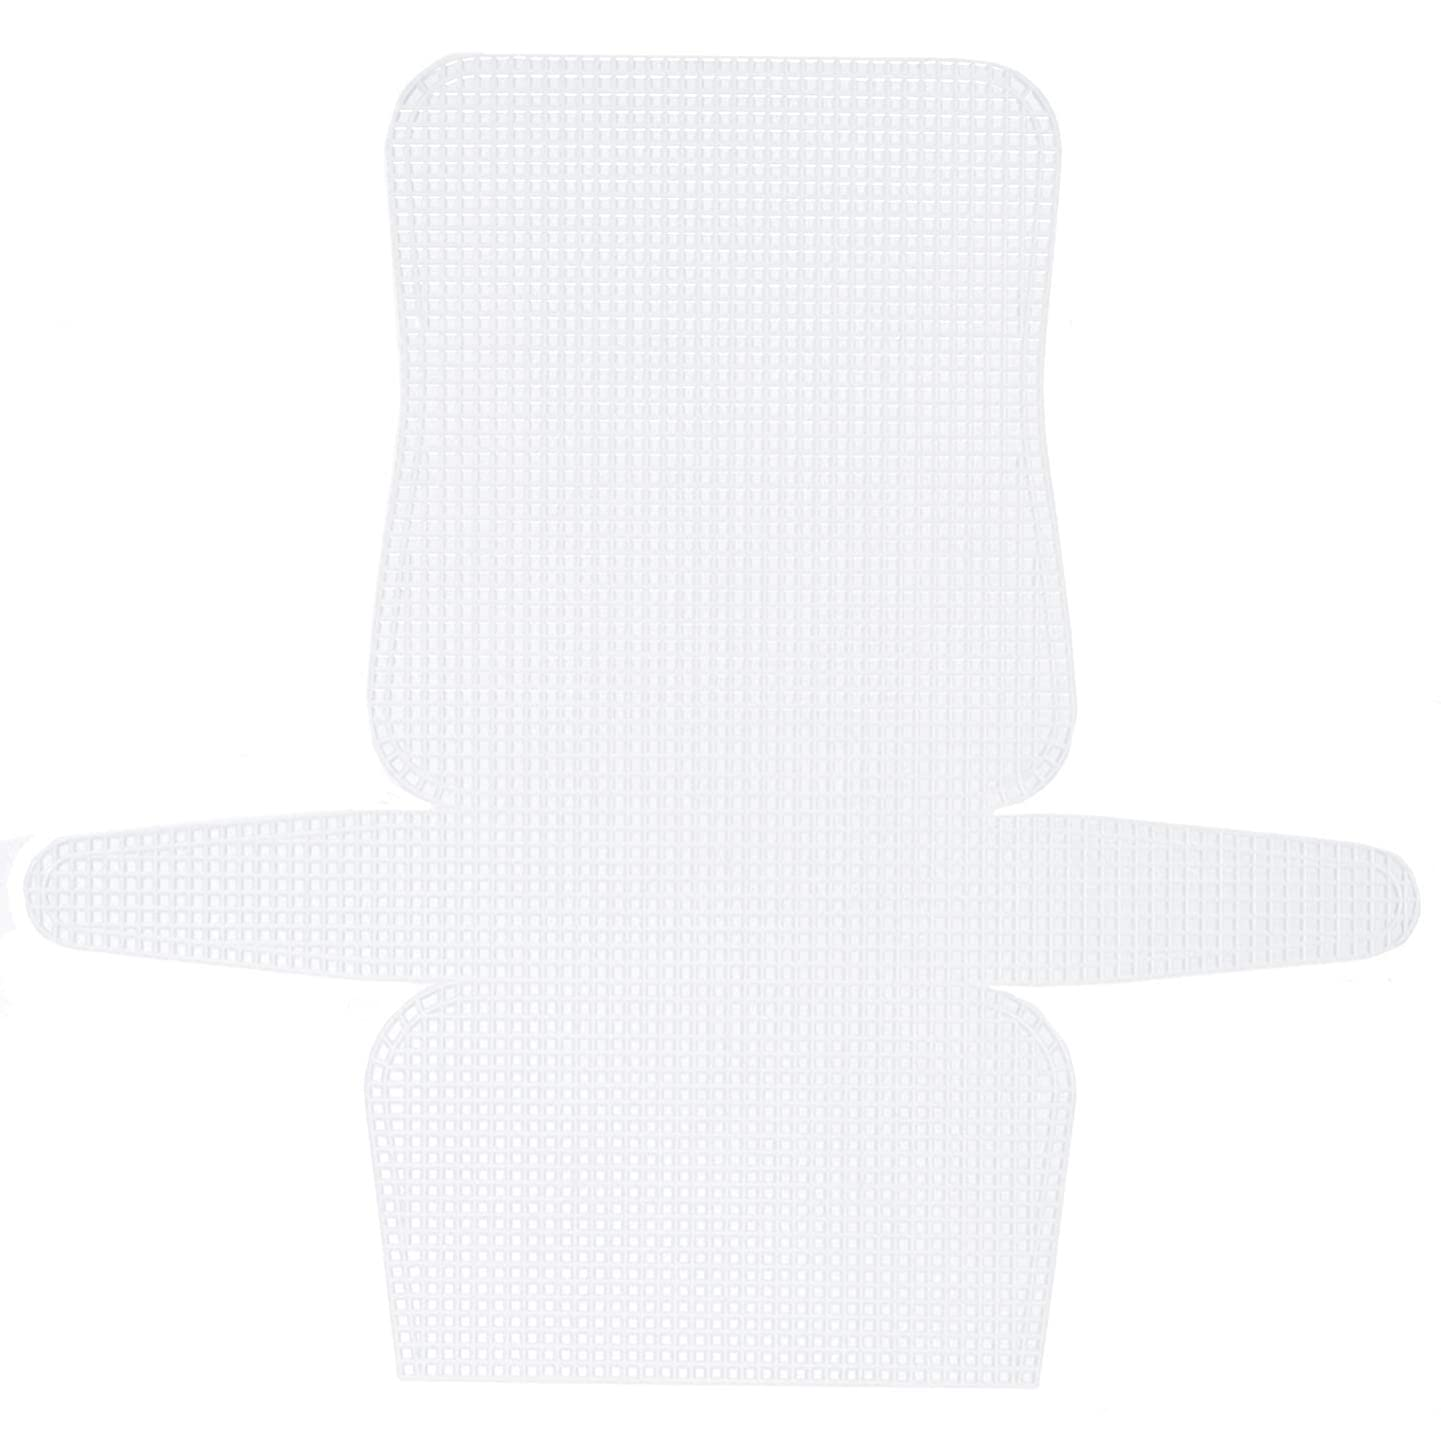 Bulk Buy: Darice DIY Crafts Purse Frame Clear 14 x 13 inches (12-Pack) 33055-1